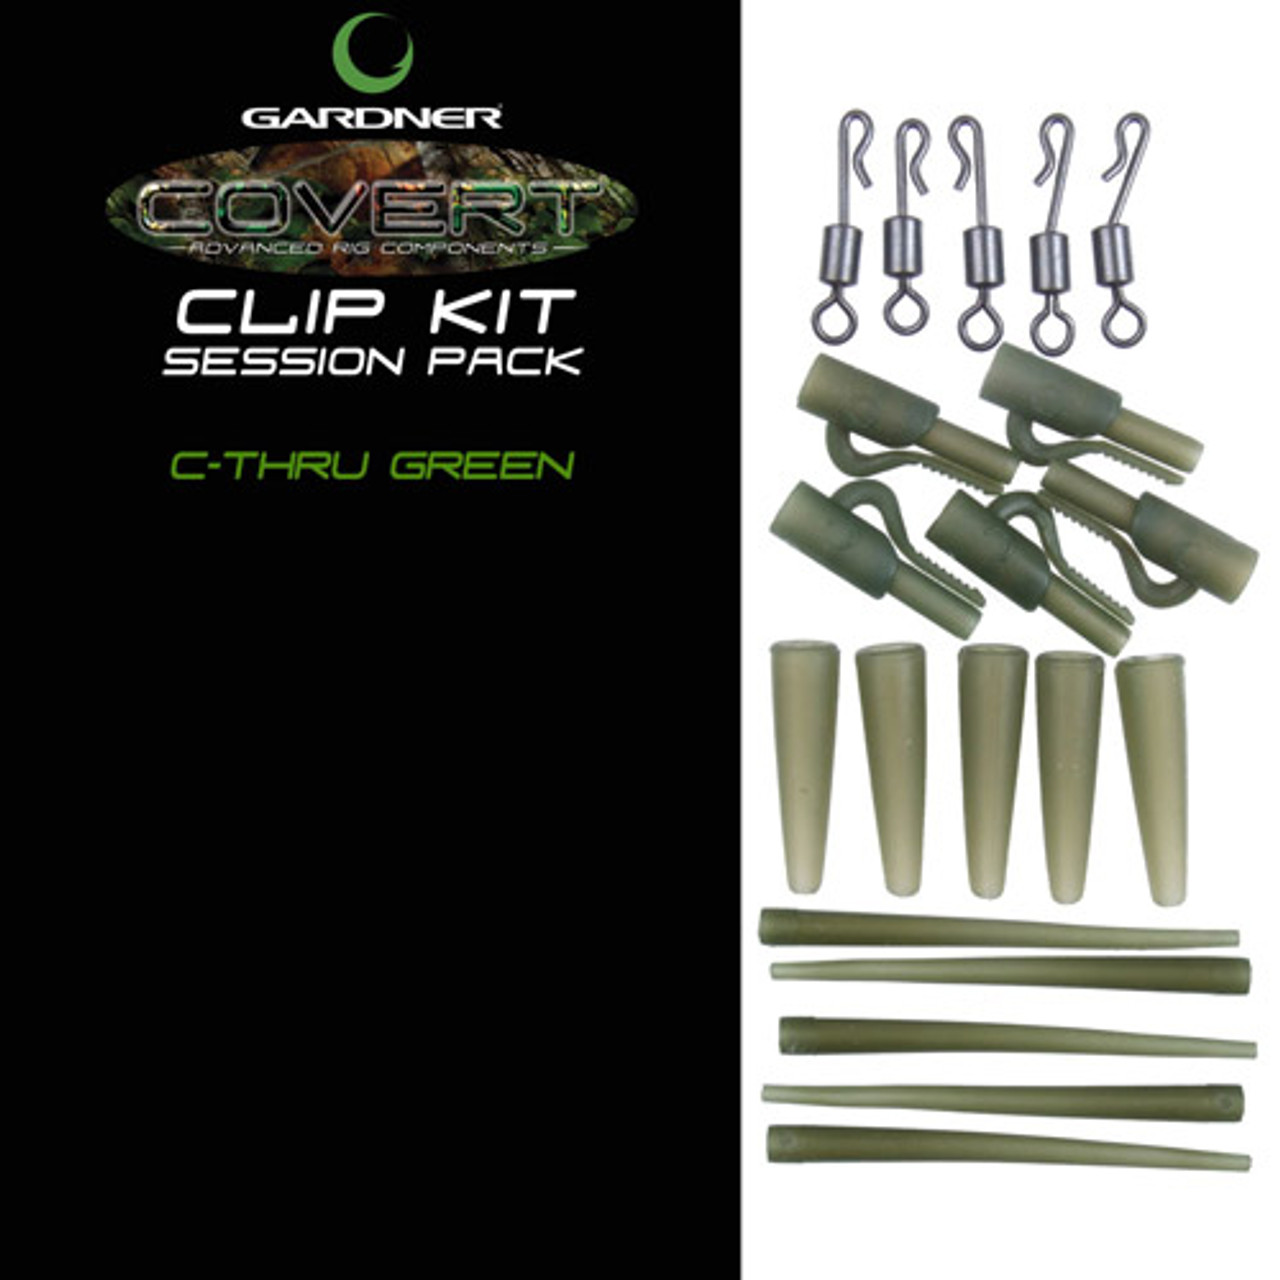 Green Lead Clip Kit